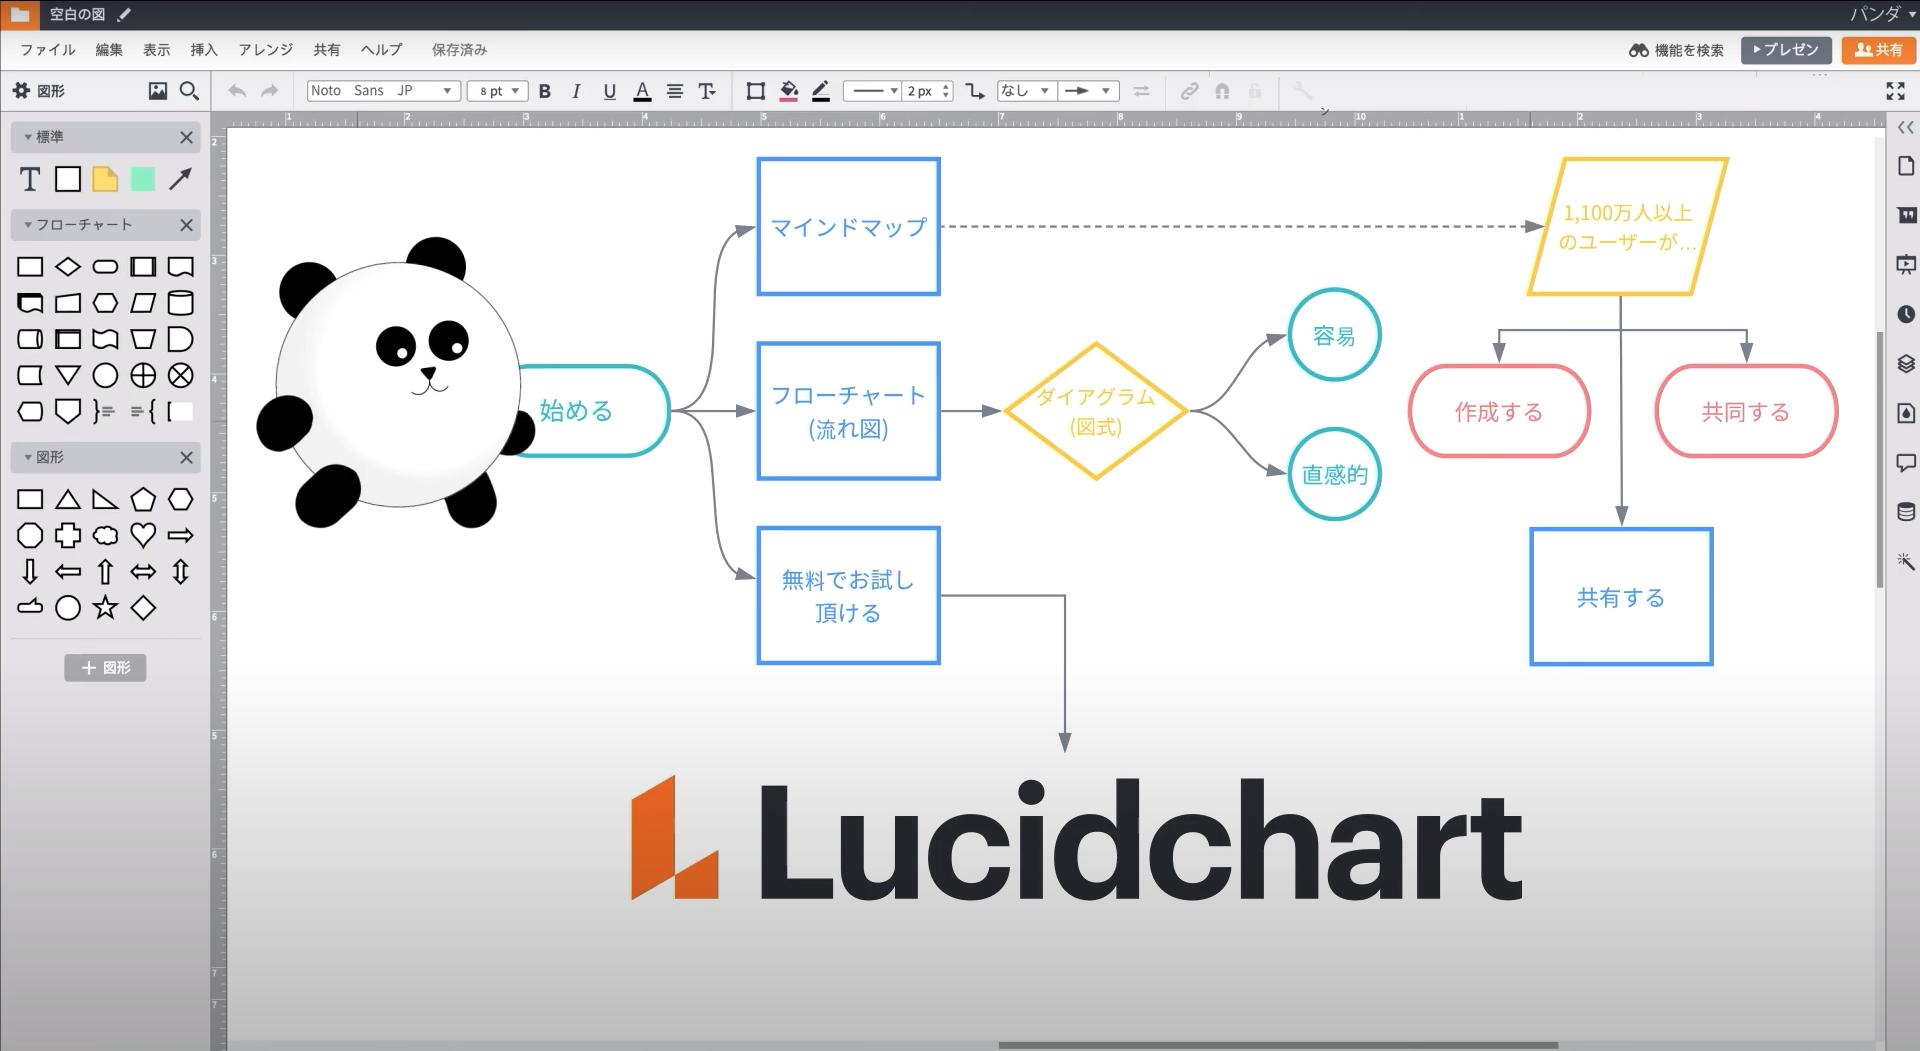 Lucidchart UML作成ツール